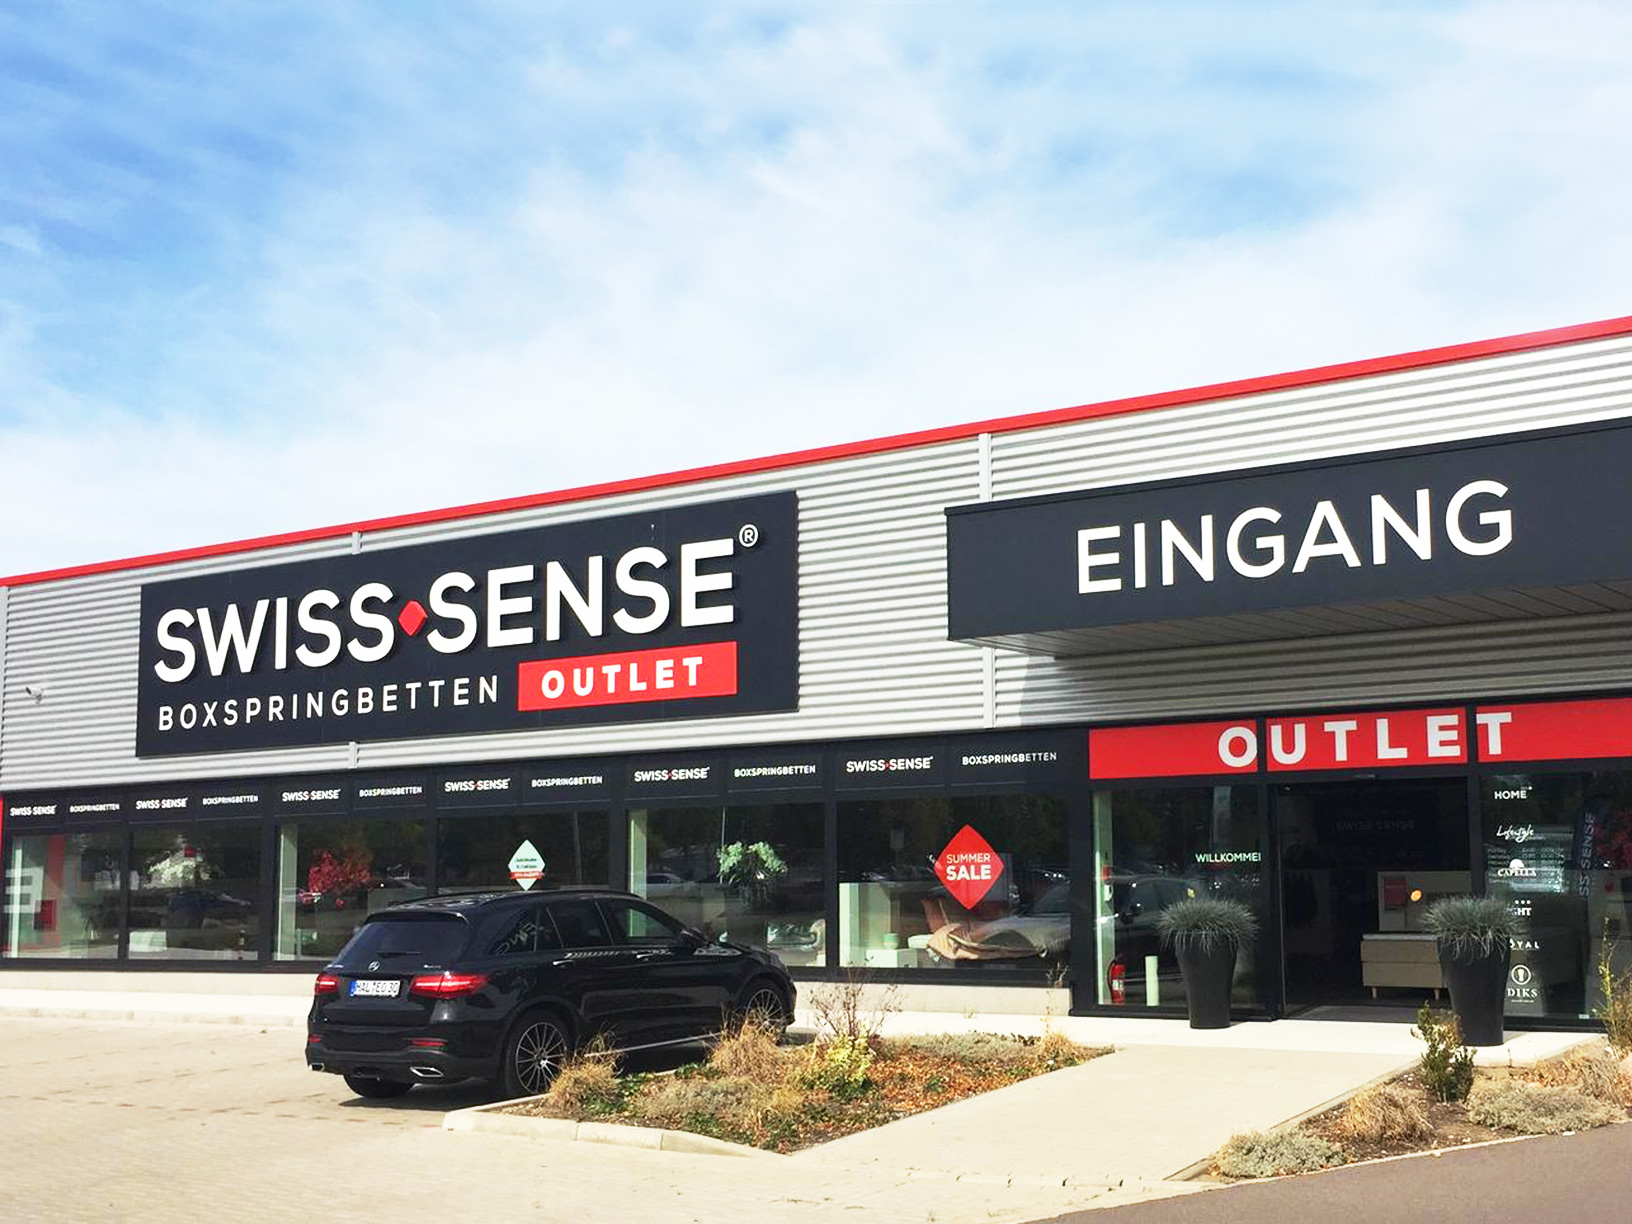 Swiss Sense Matras : Boxspringbetten und textilien in outlet halle swiss sense